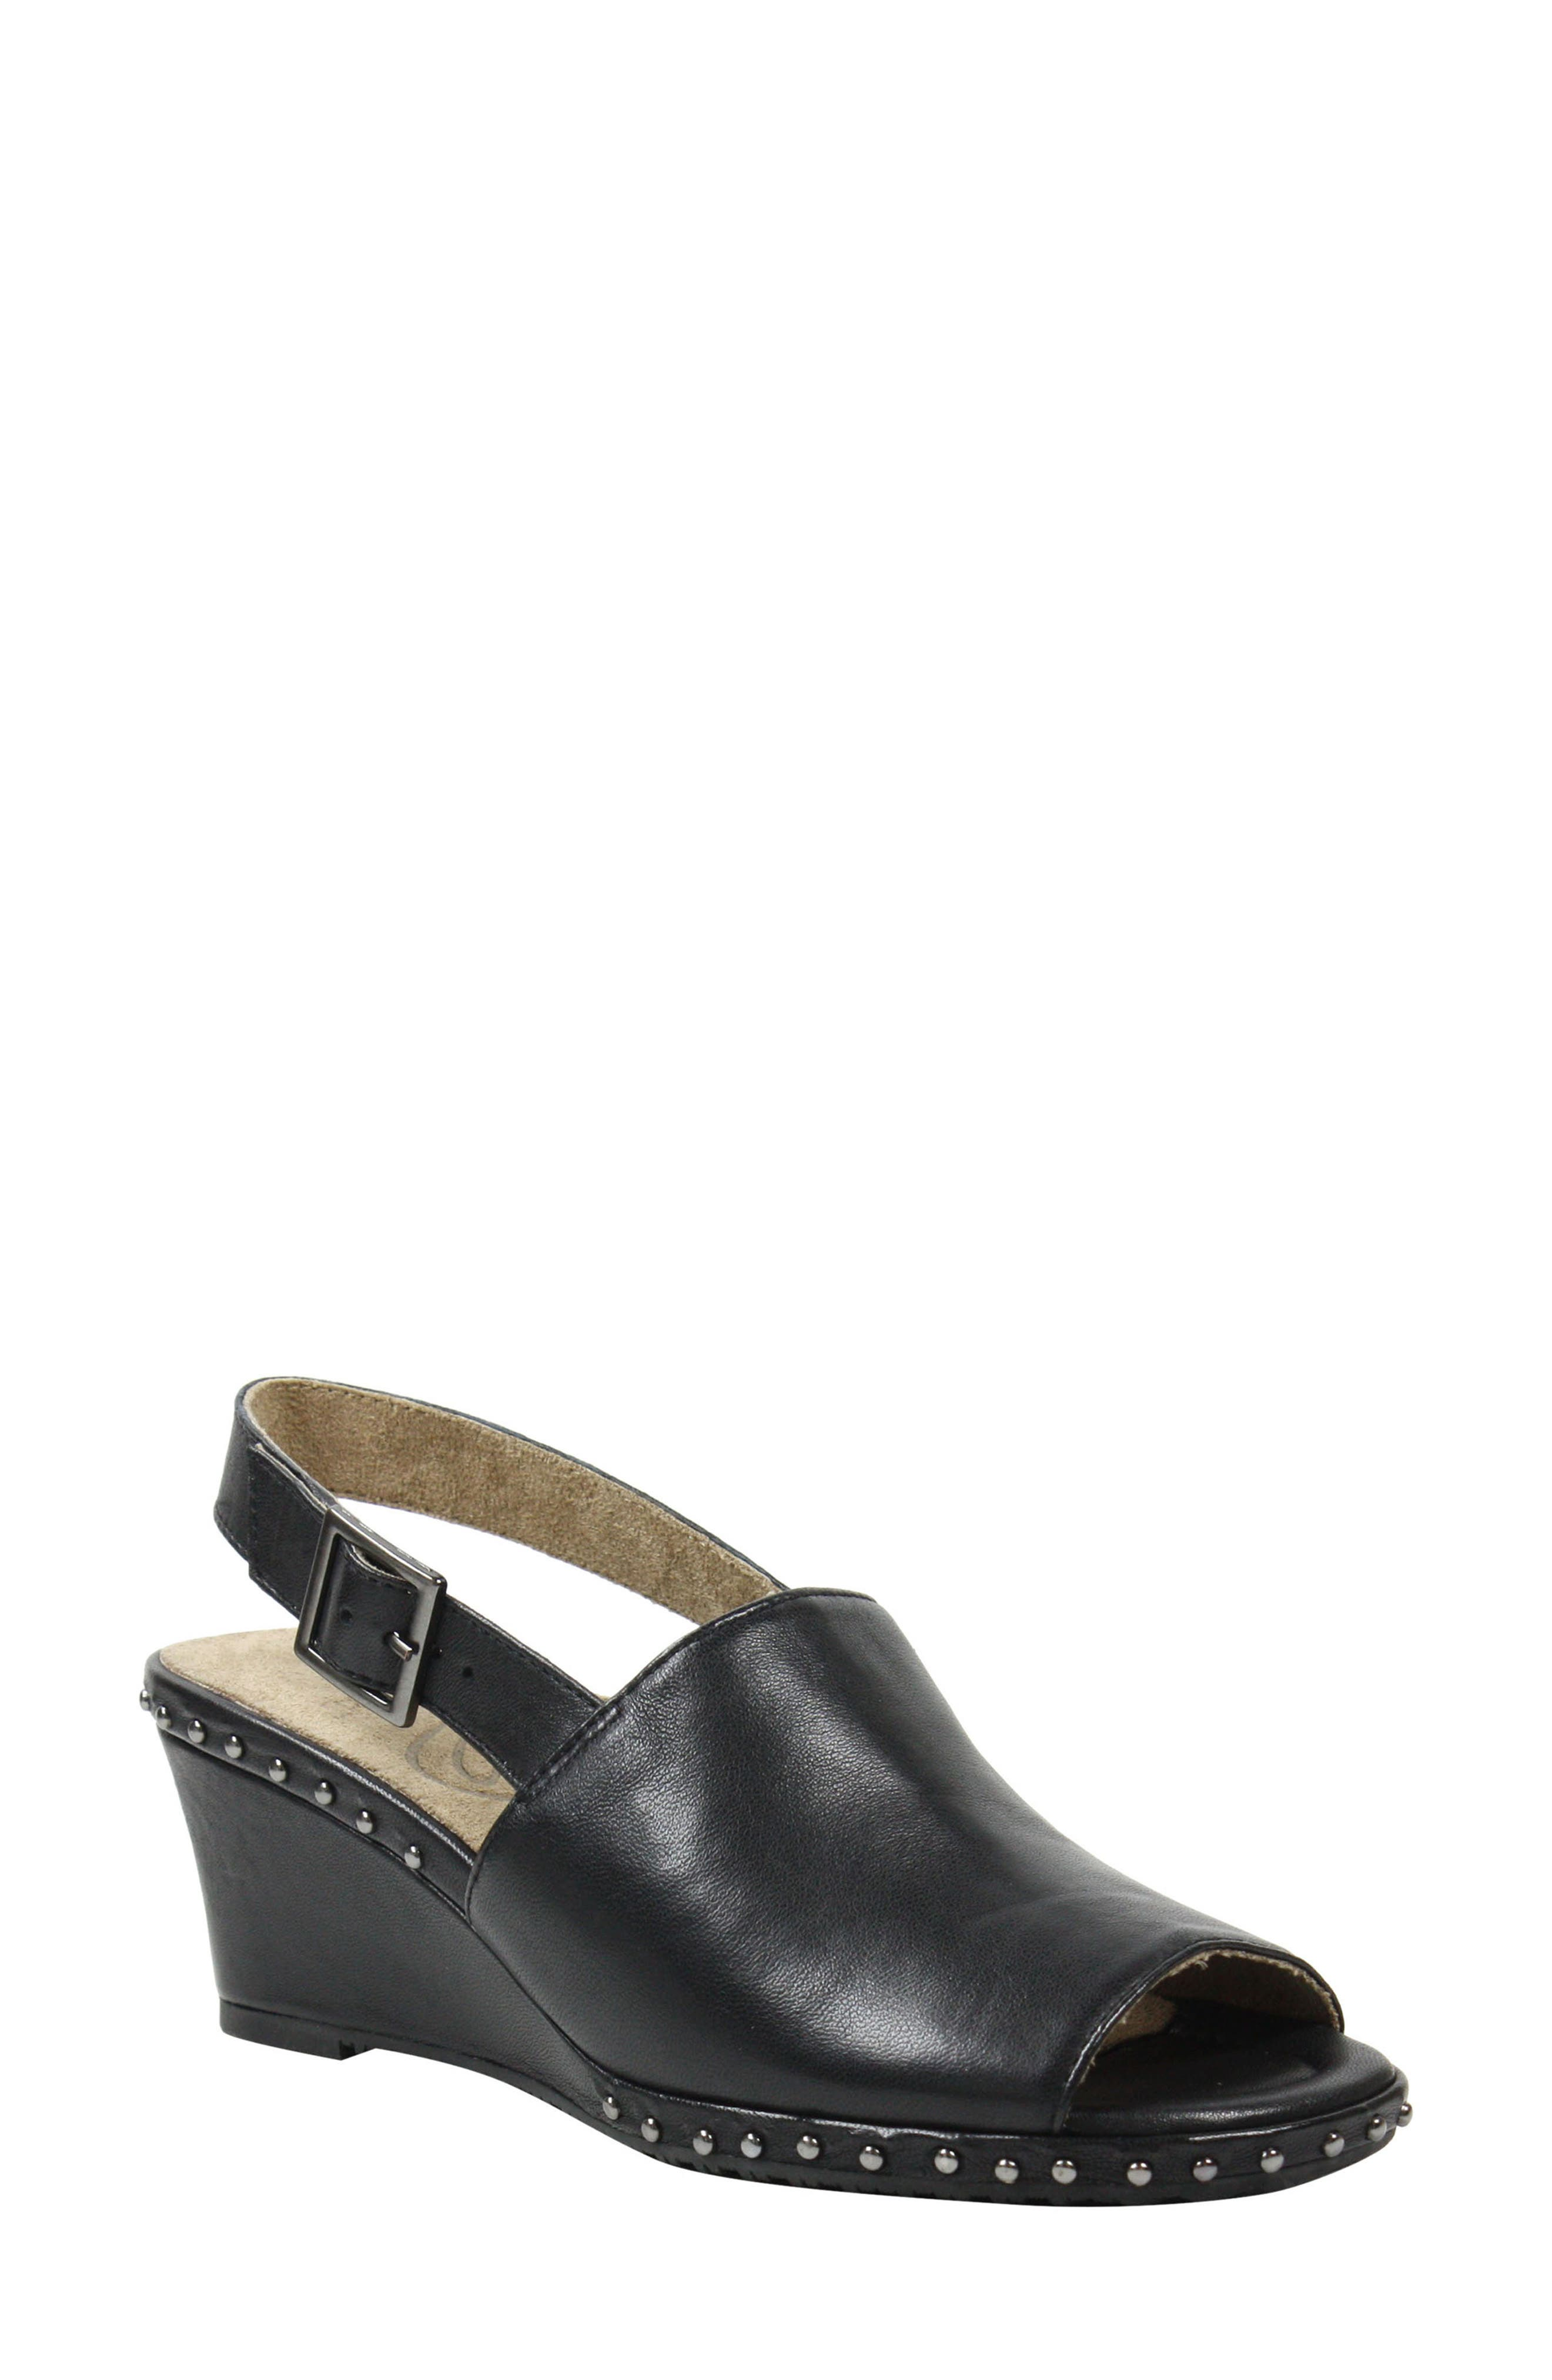 J. RENEÉ Antandra Wedge Sandal, Main, color, BLACK LEATHER